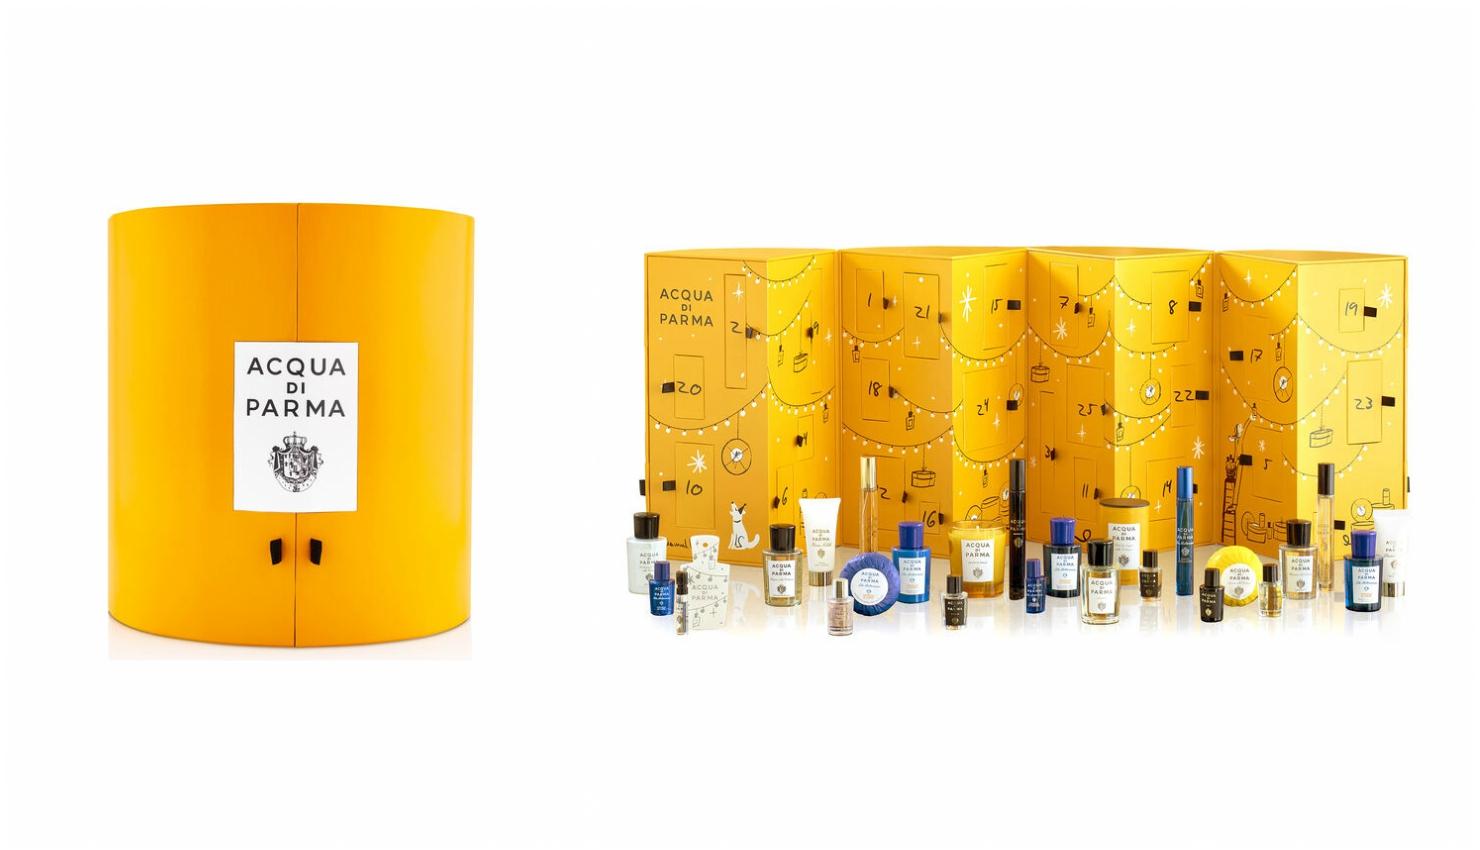 Calendario de adviento Acqua di Parma